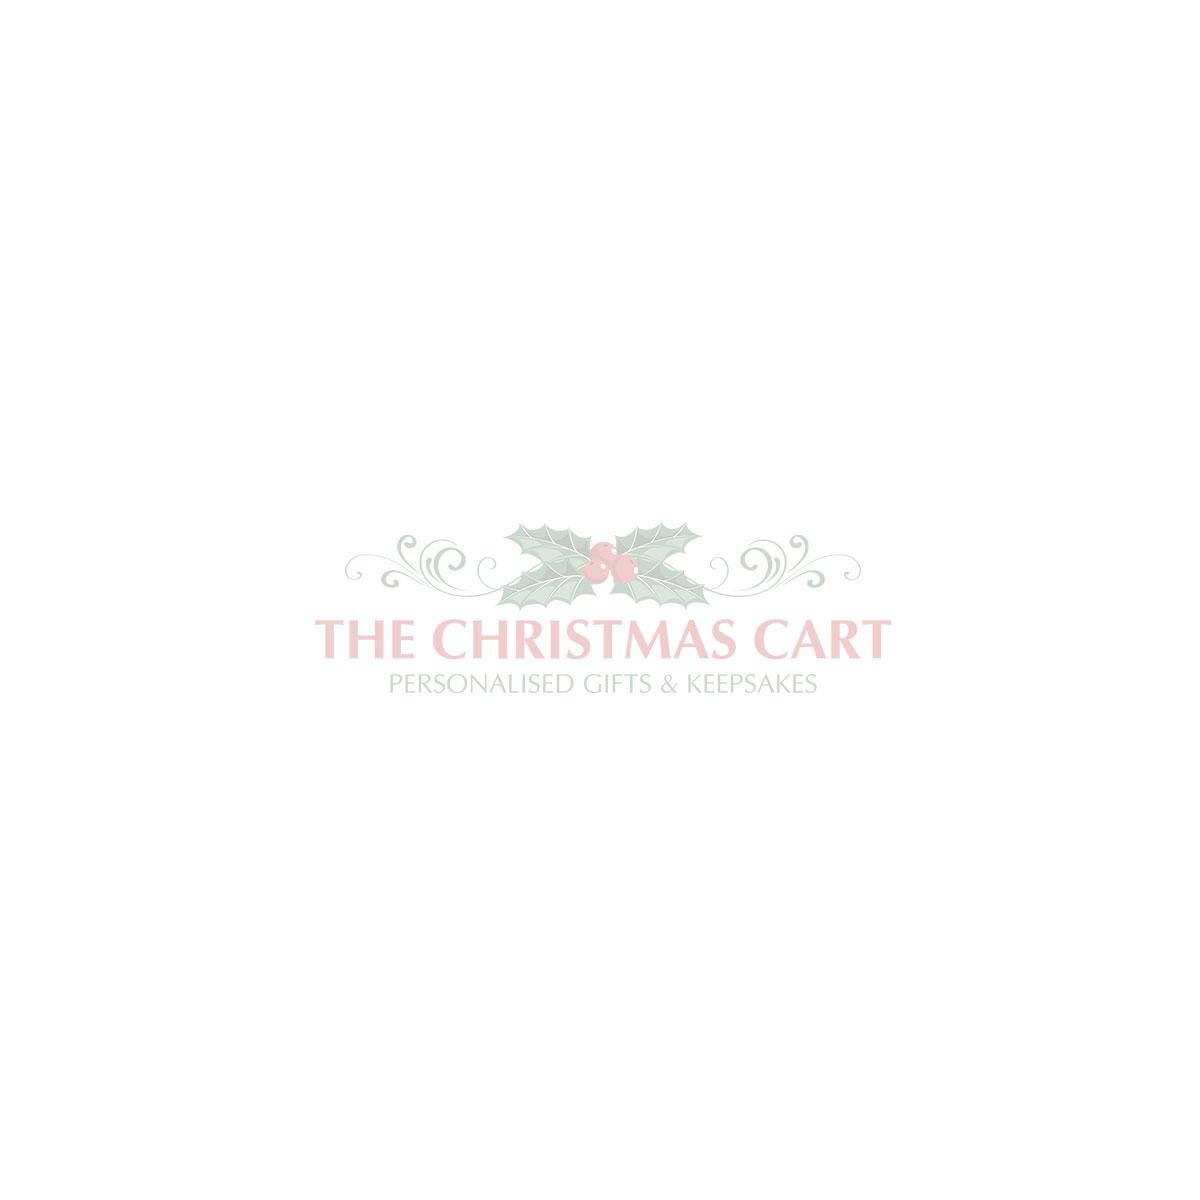 Thursday 21st November @ 11am - Elf or Santa Legs Christmas Wreath Workshop